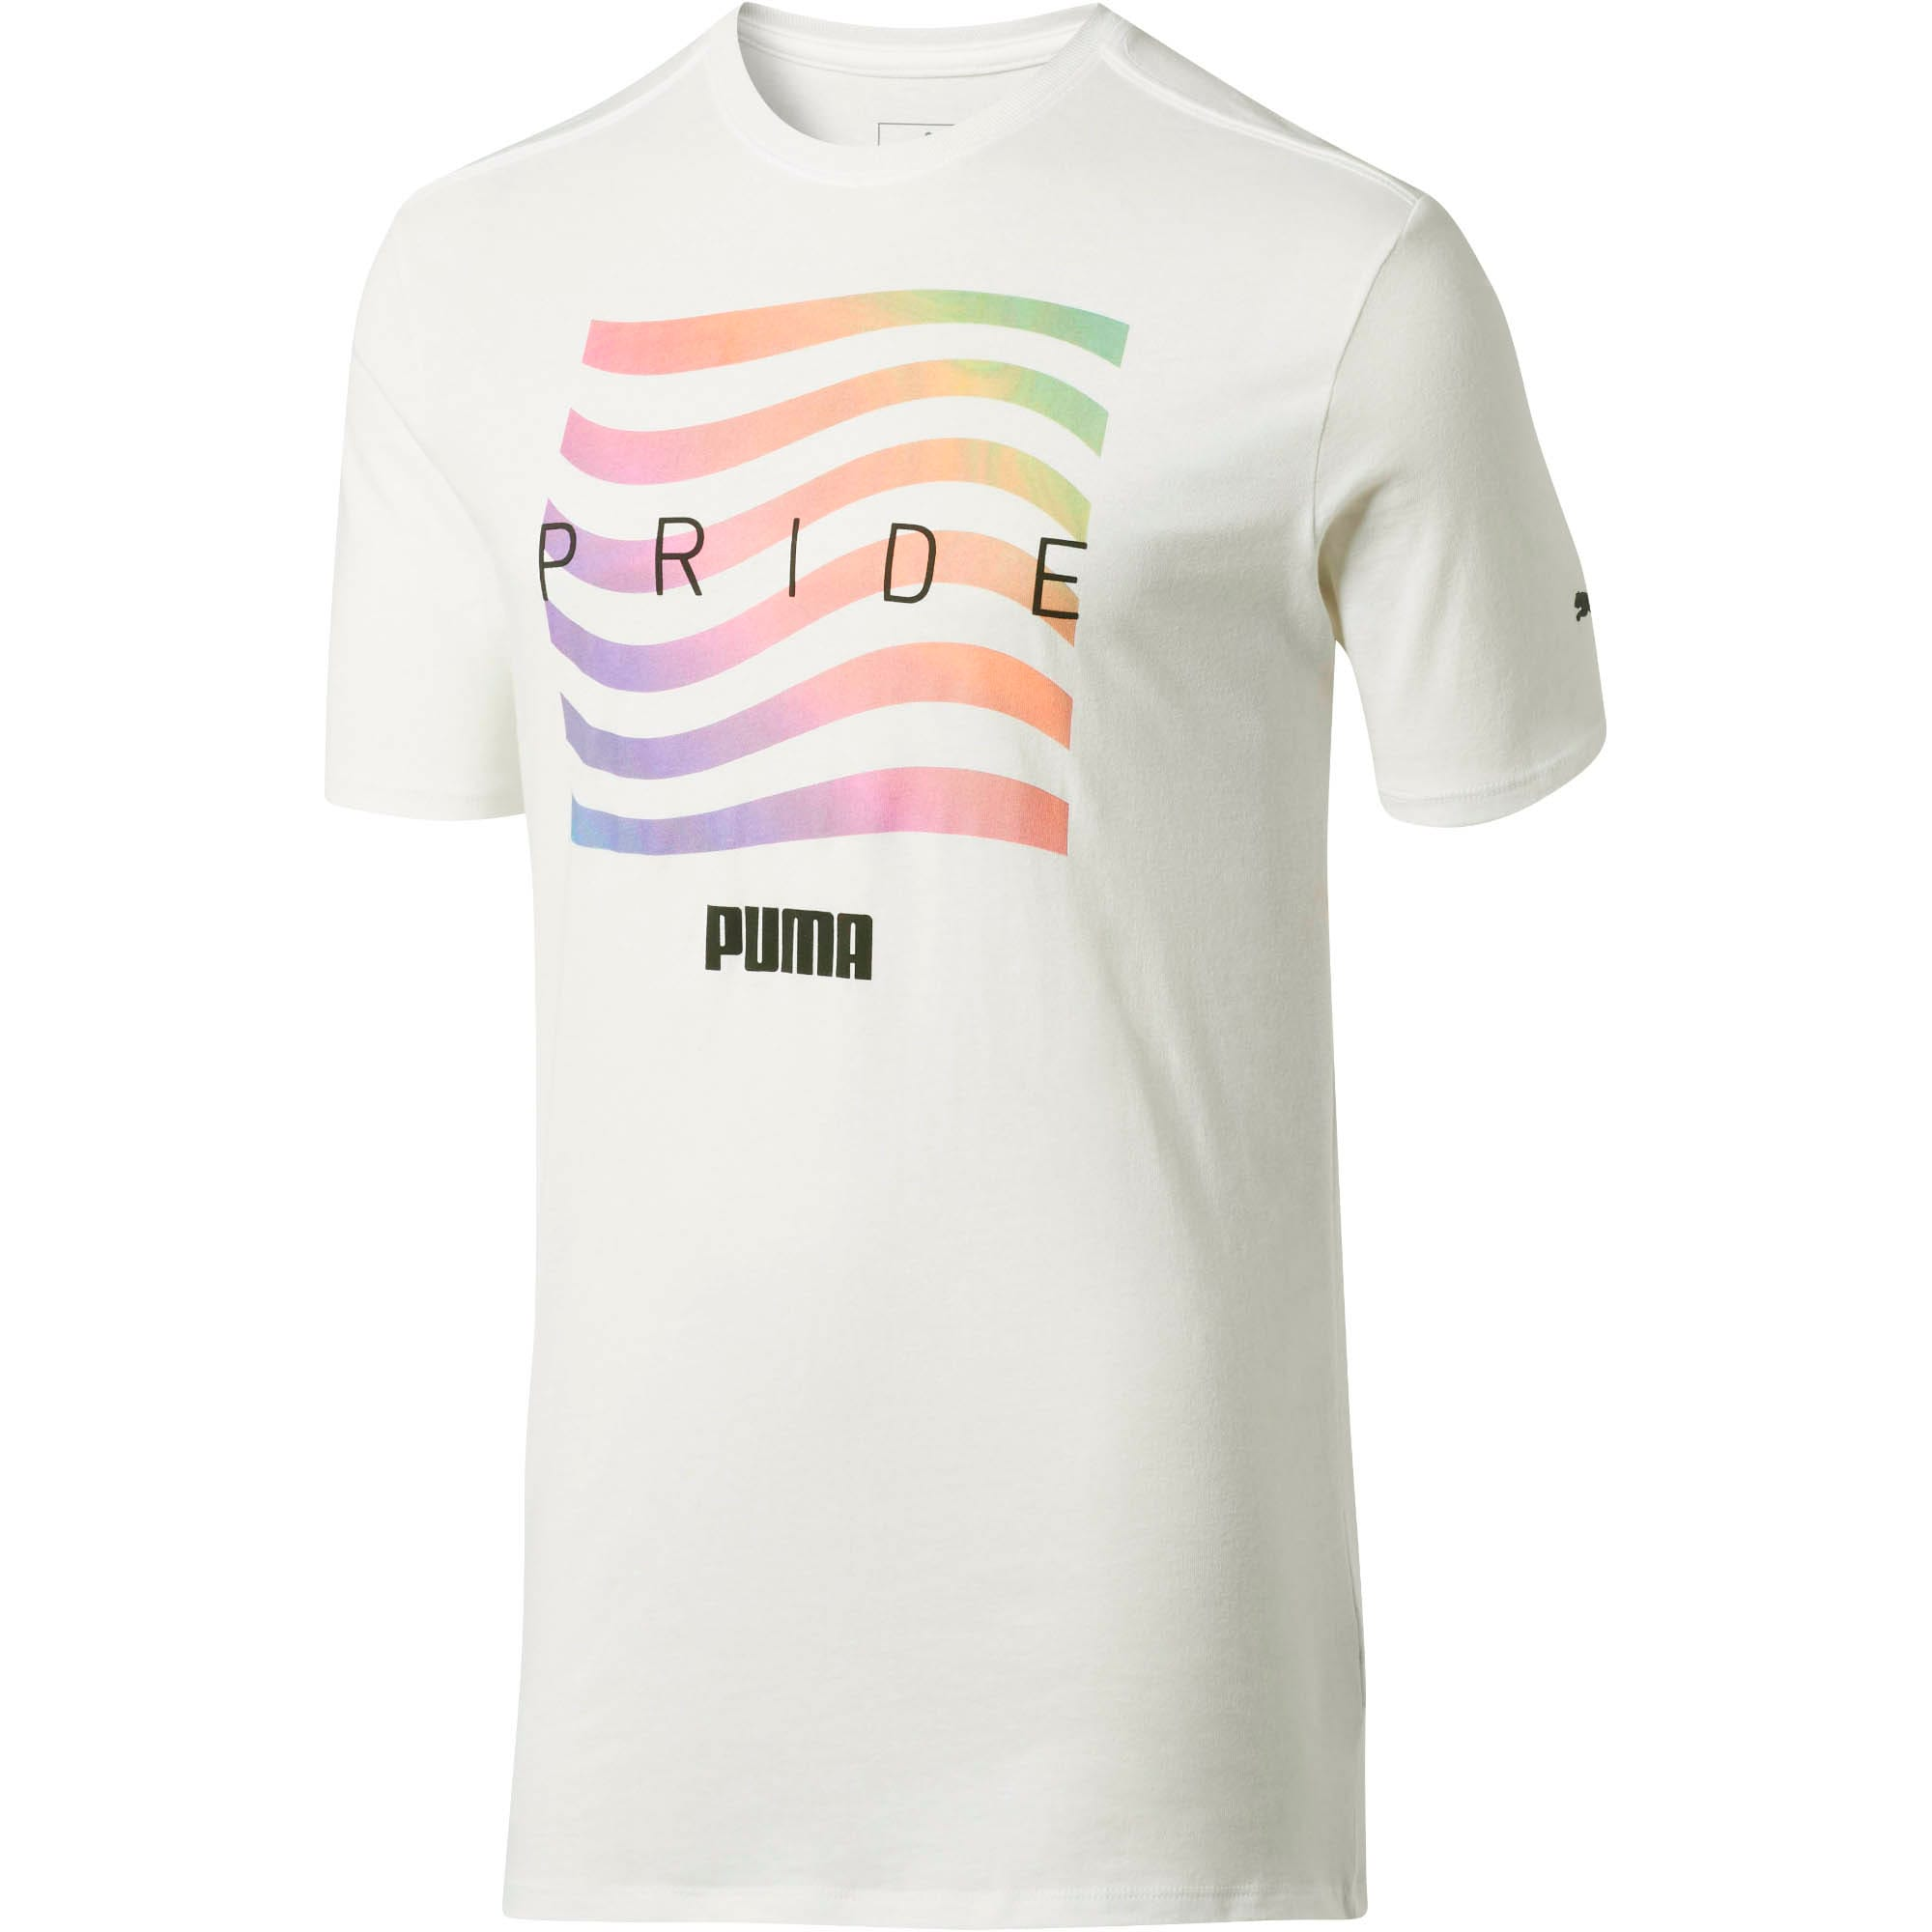 Thumbnail 2 of Pride Men's Tee, Puma White, medium